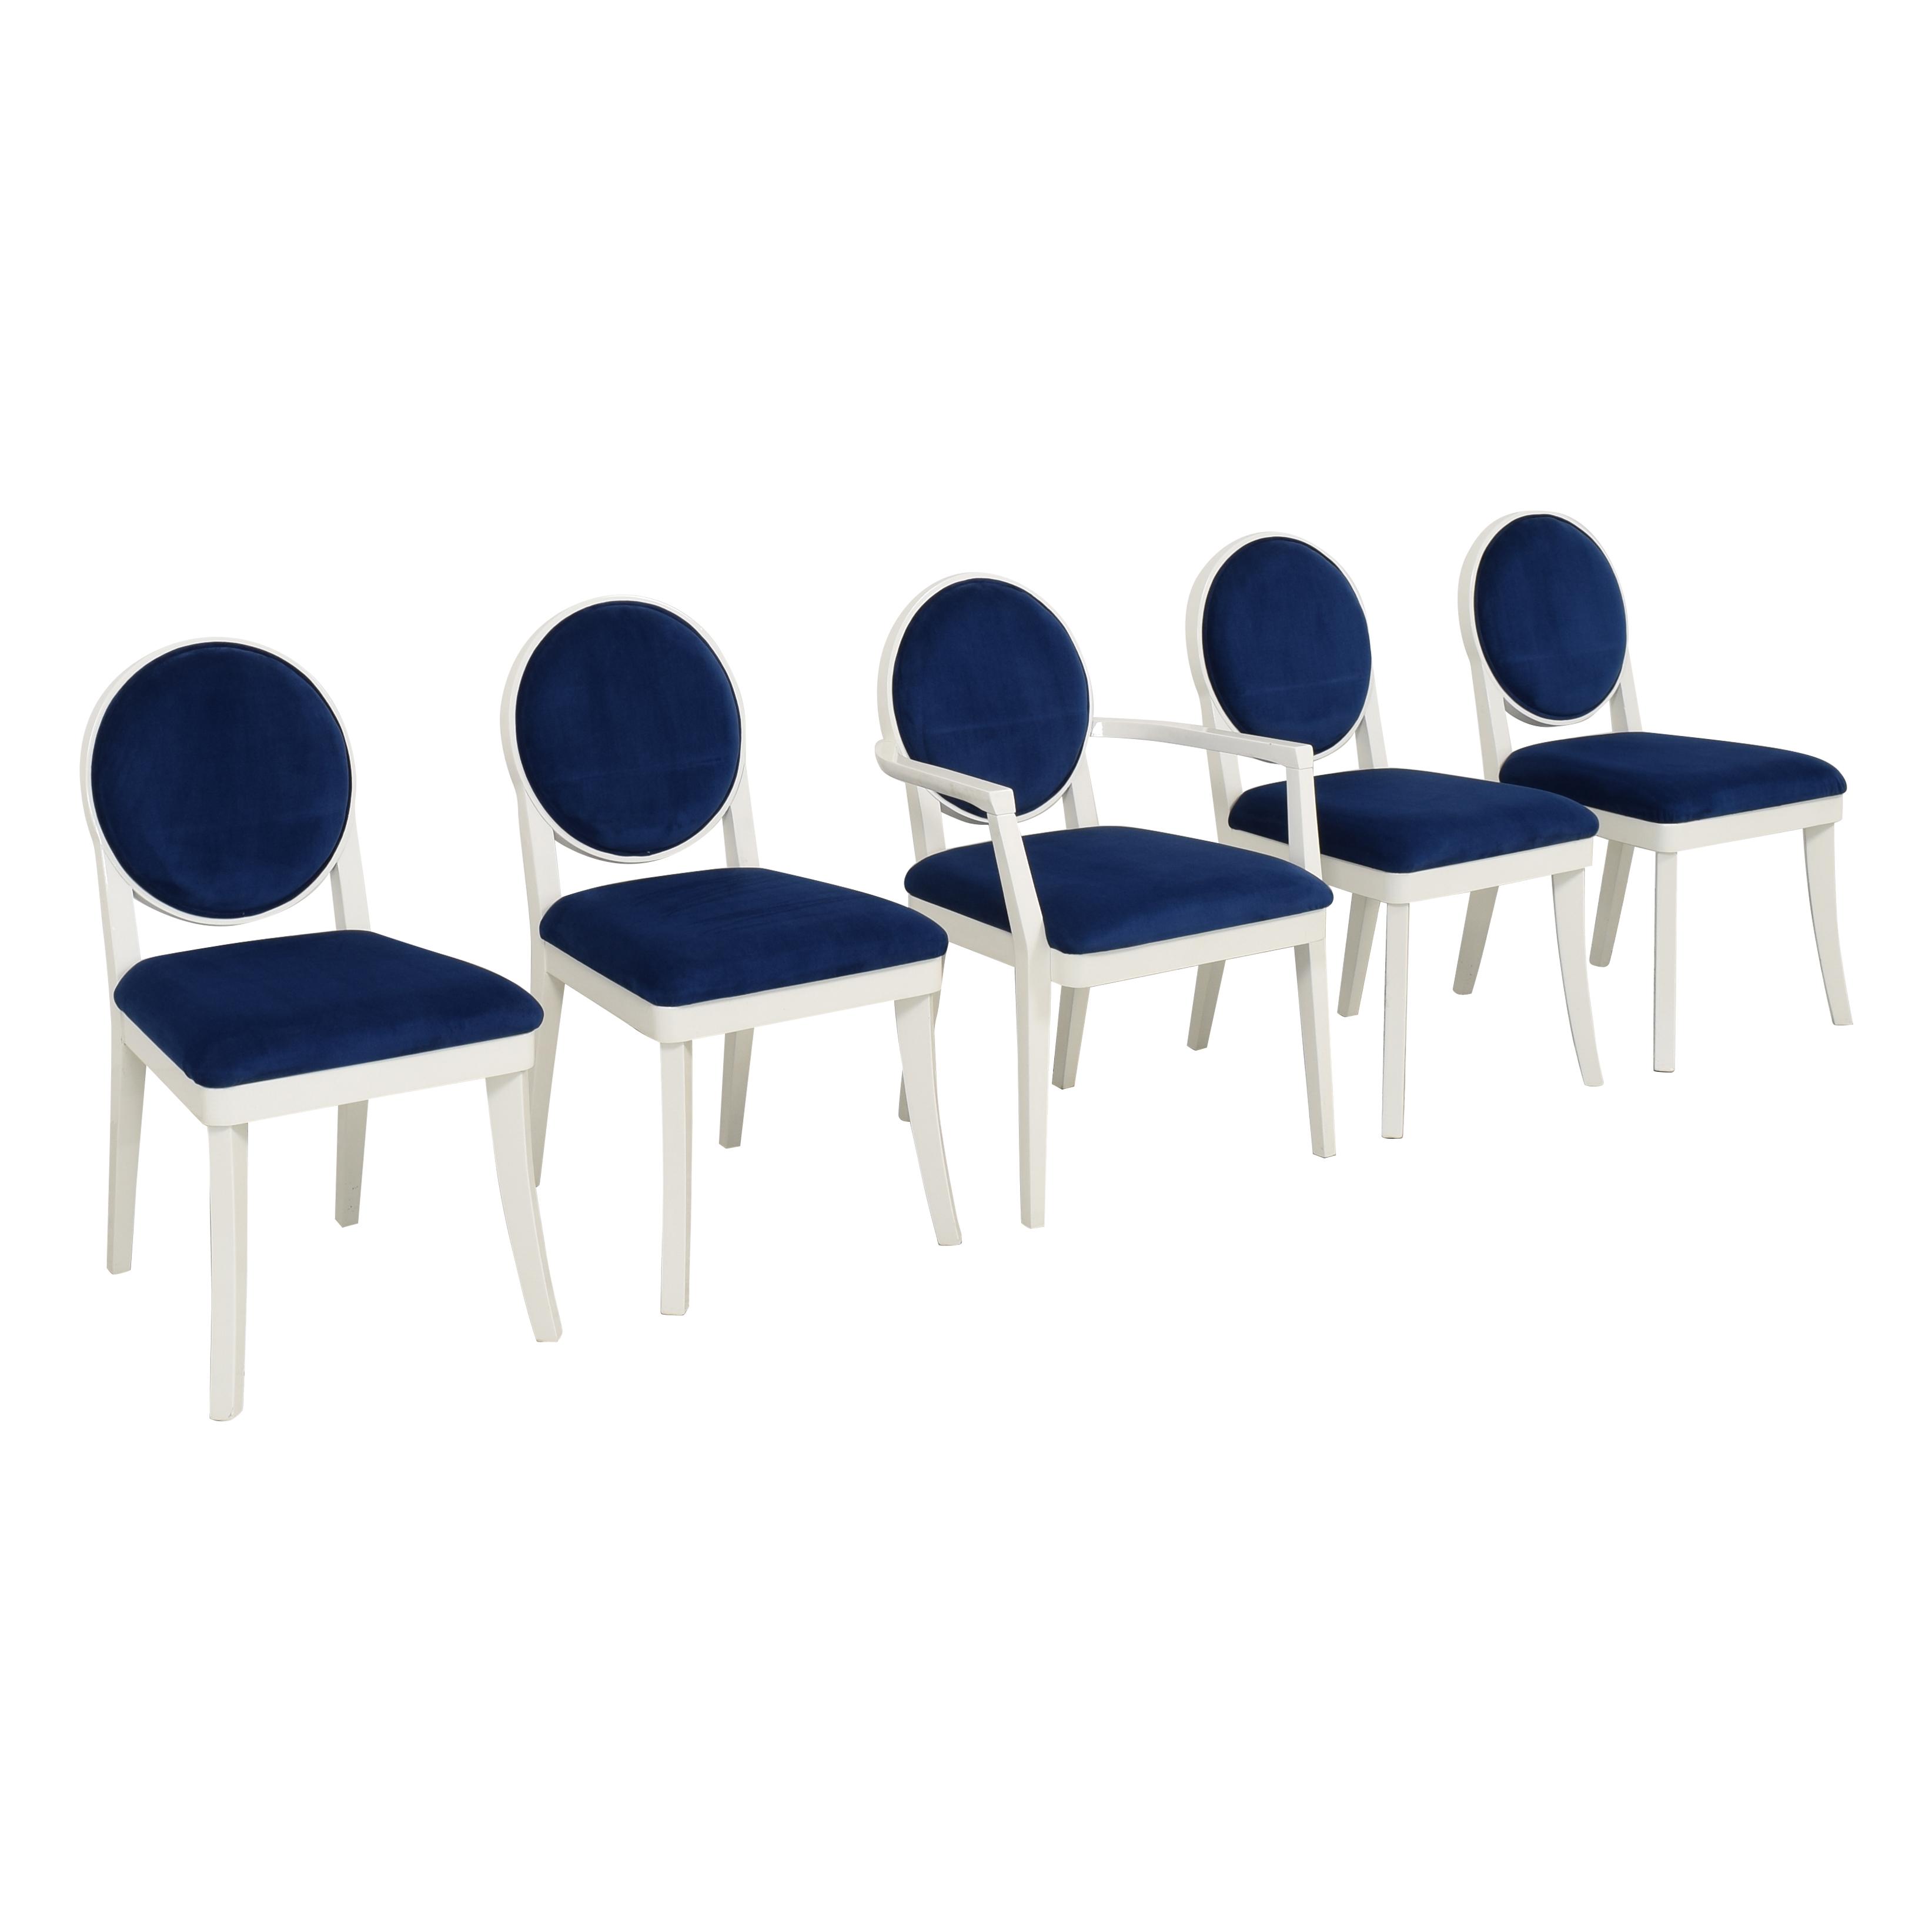 Jonathan Adler Jonathan Adler Happy Chic Dining Chairs ma